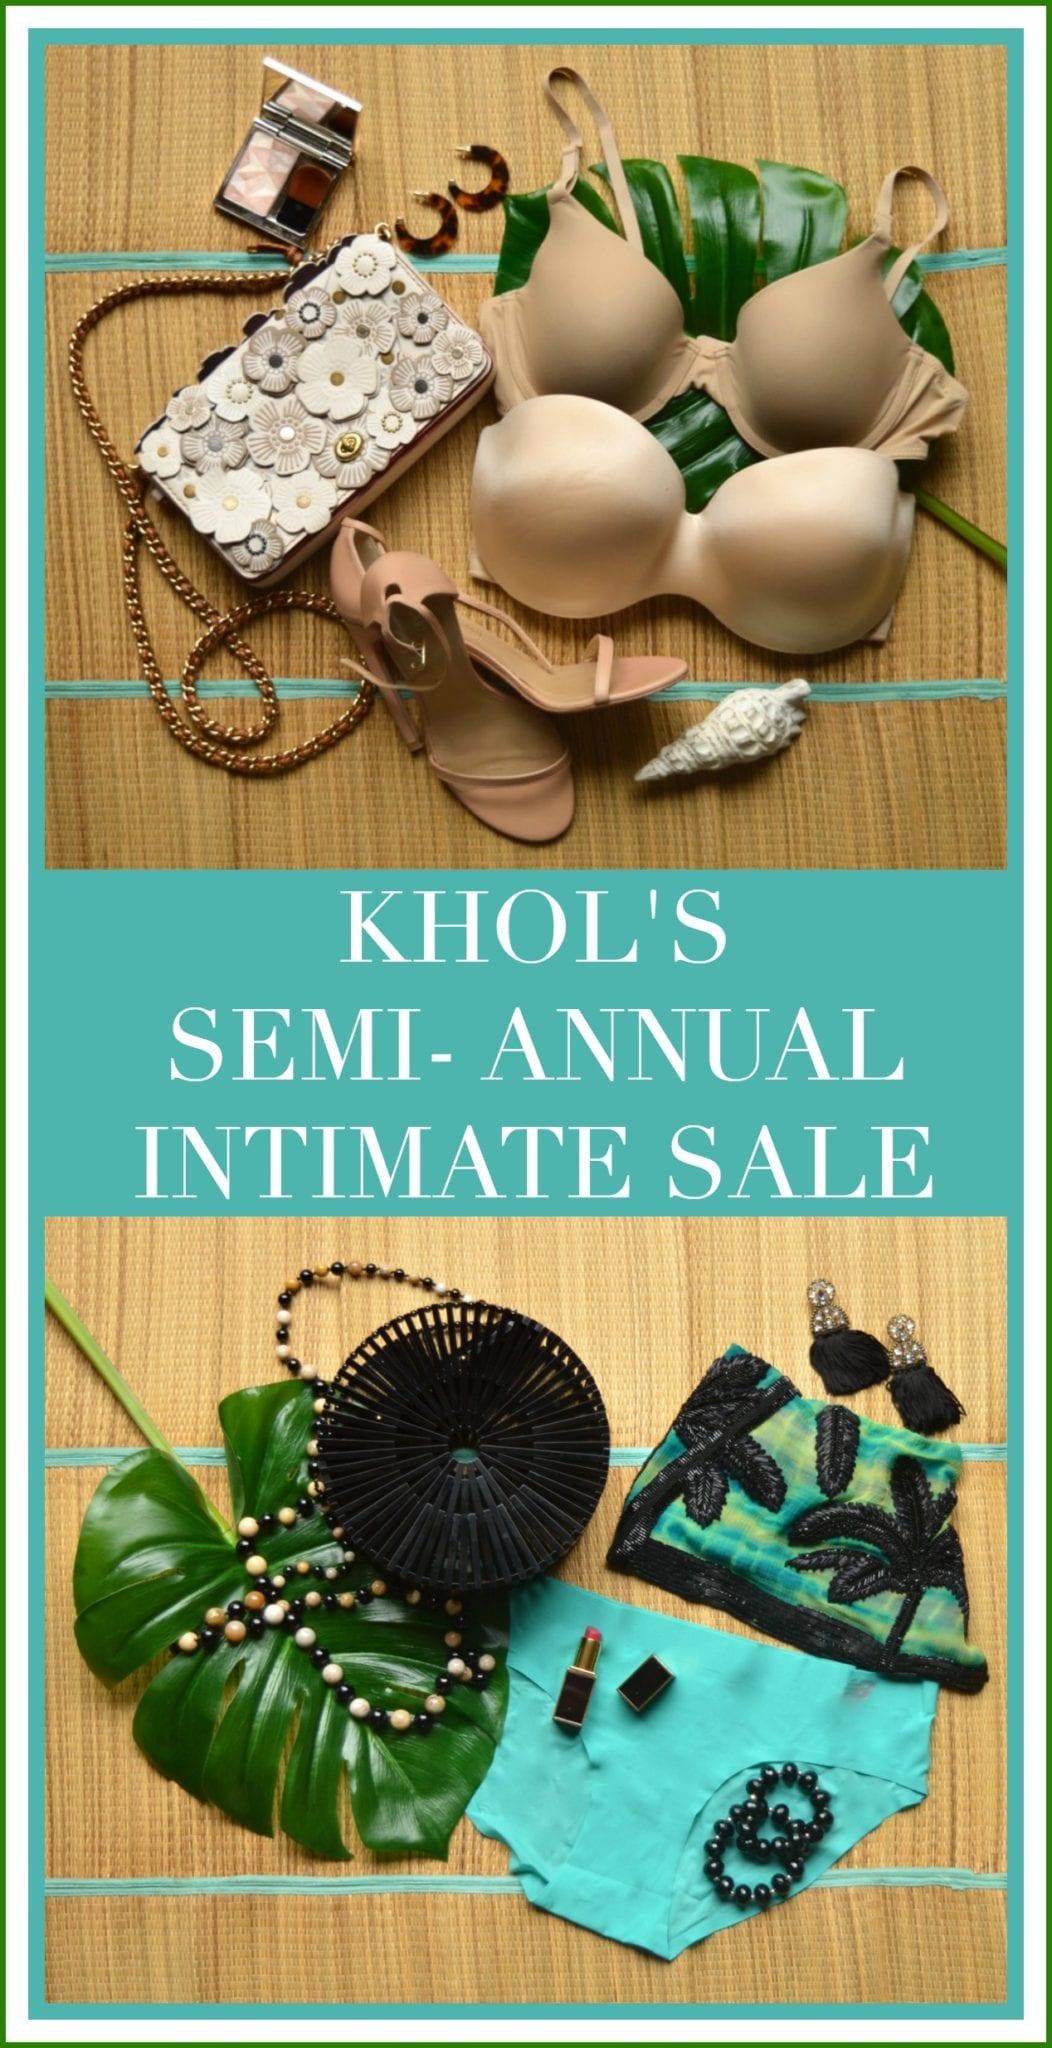 khols, intimates, khols intimate sale